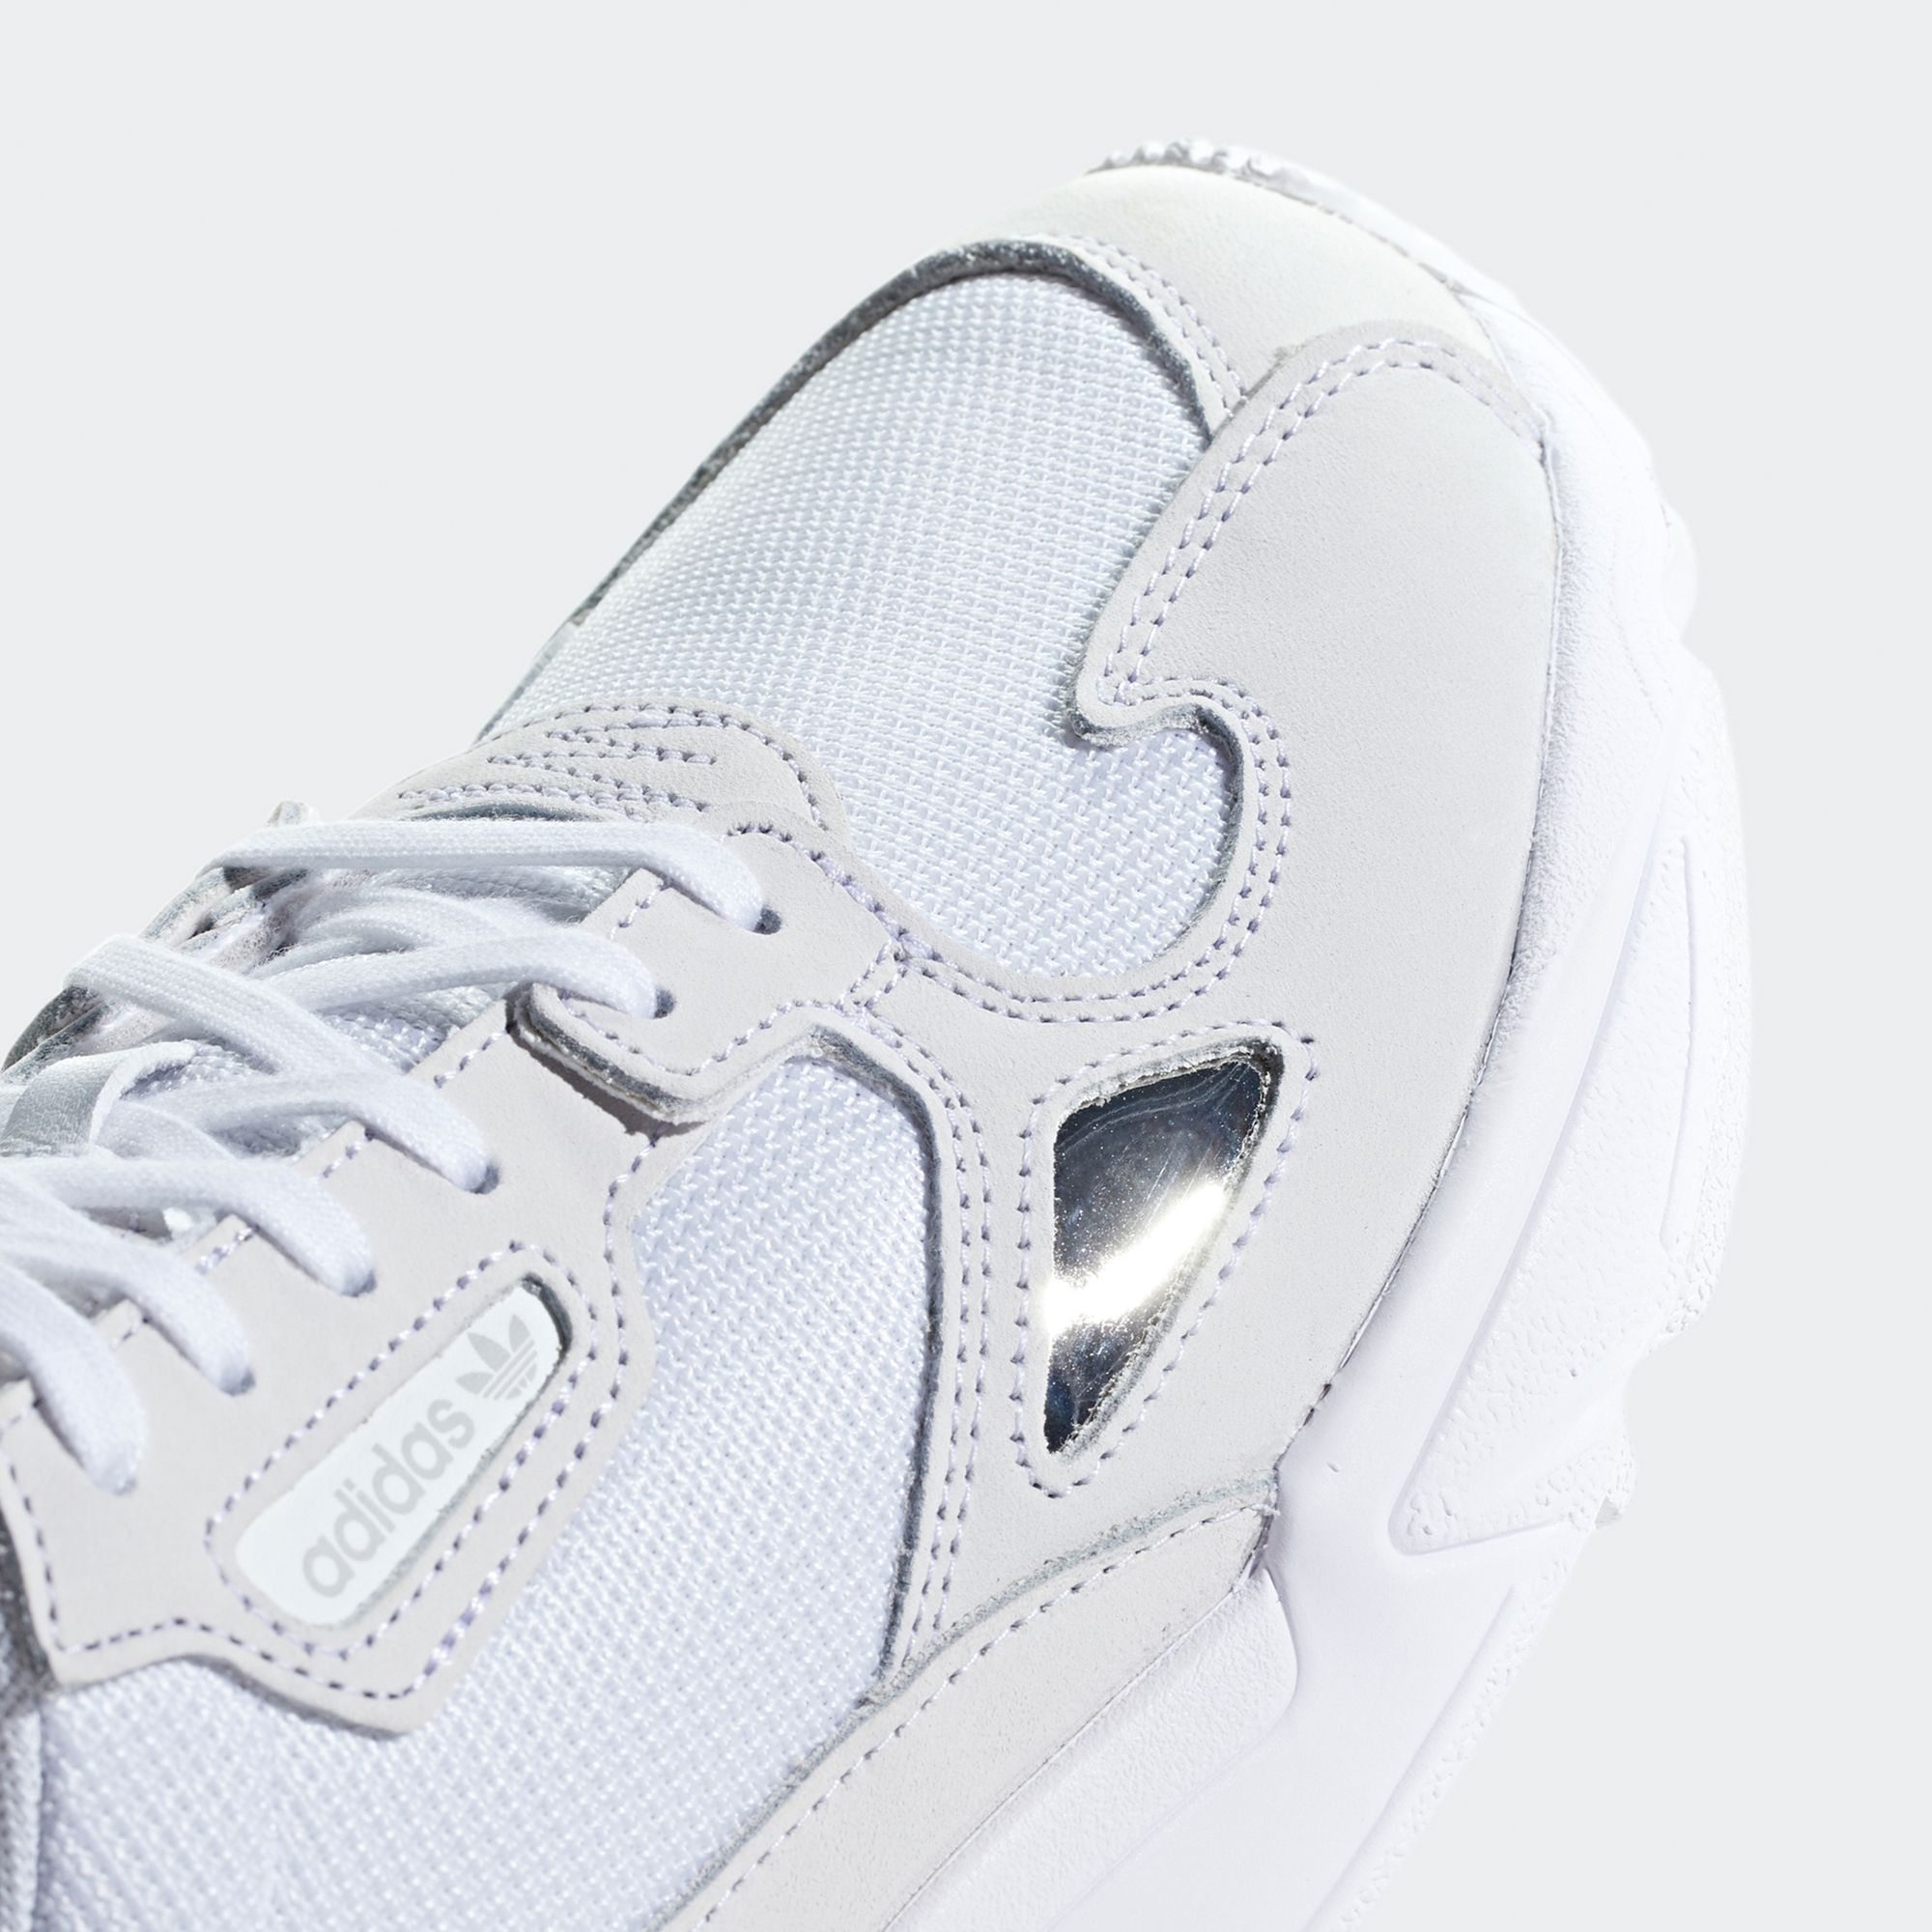 Adidas Falcon sneakers i skinn, dam